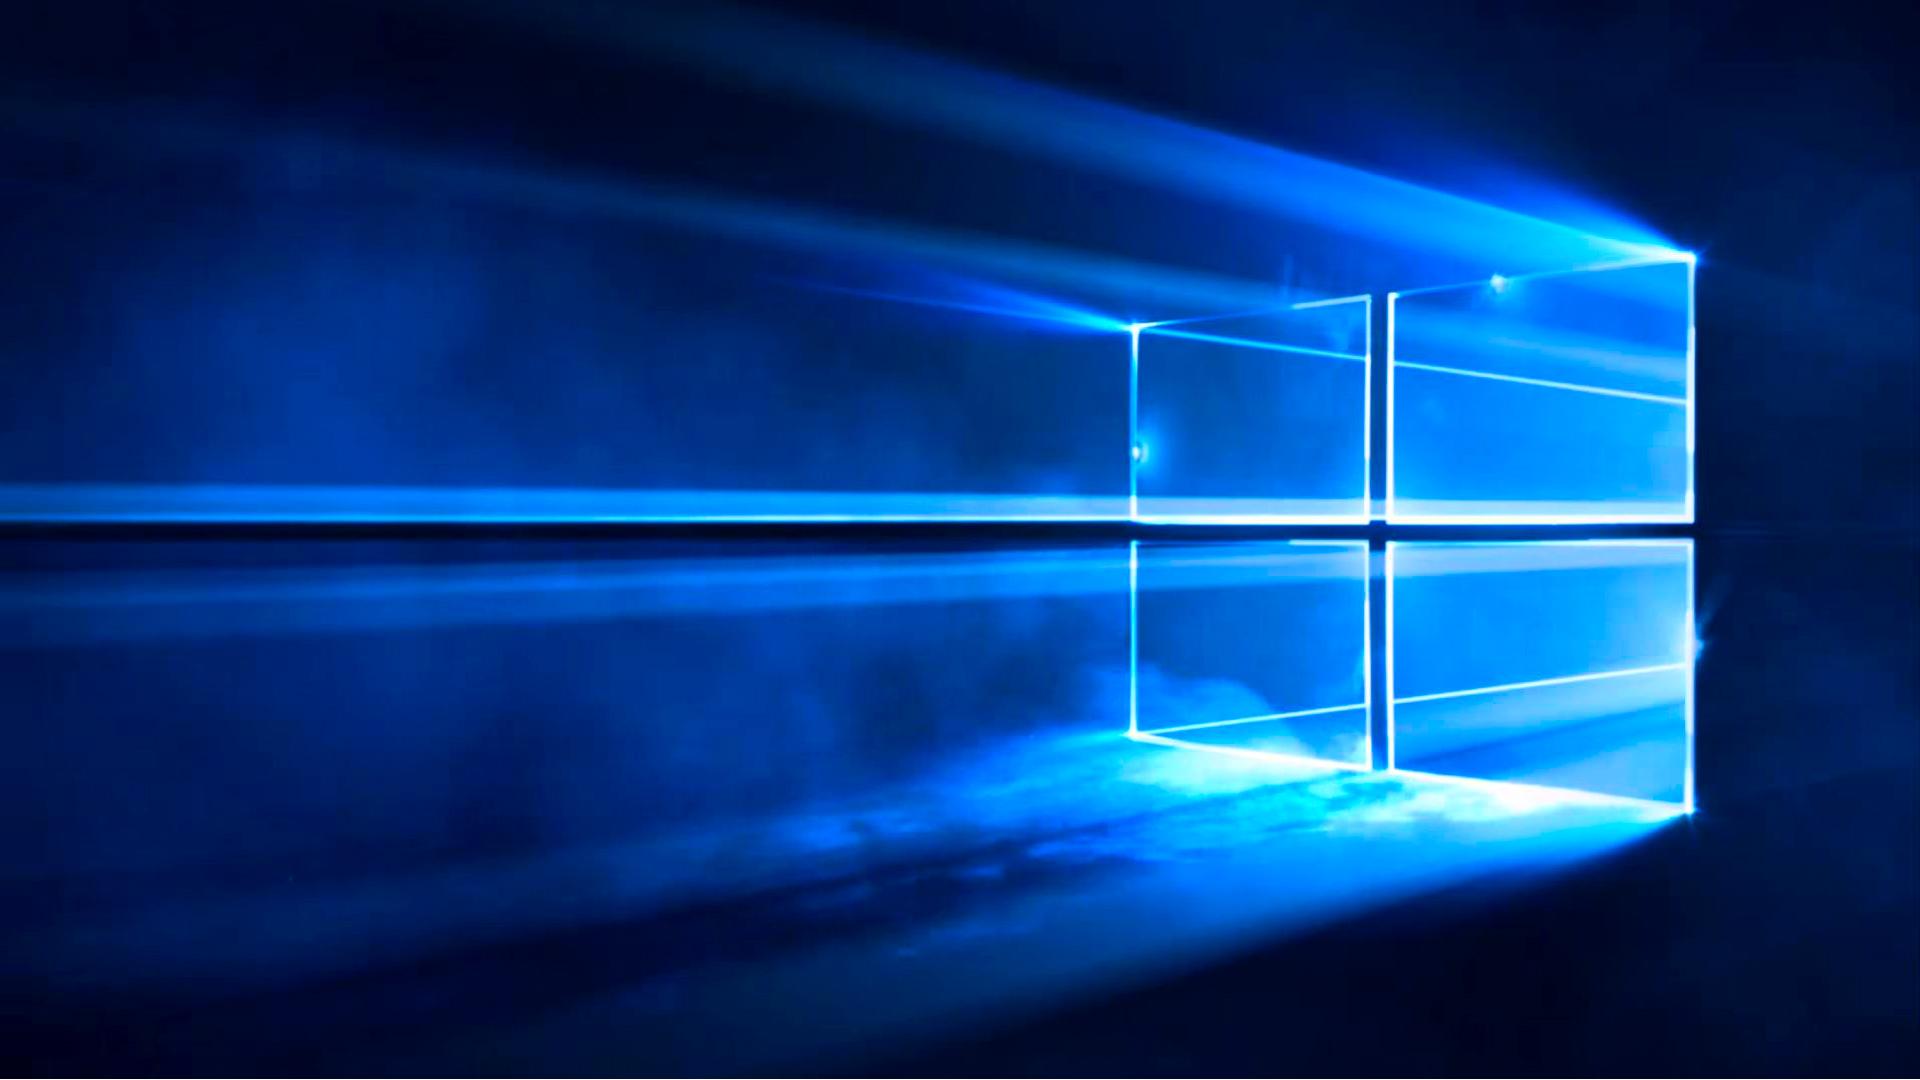 Microsoft Windows 10 Full HD Pics Wallpapers 15197   Amazing 1920x1080